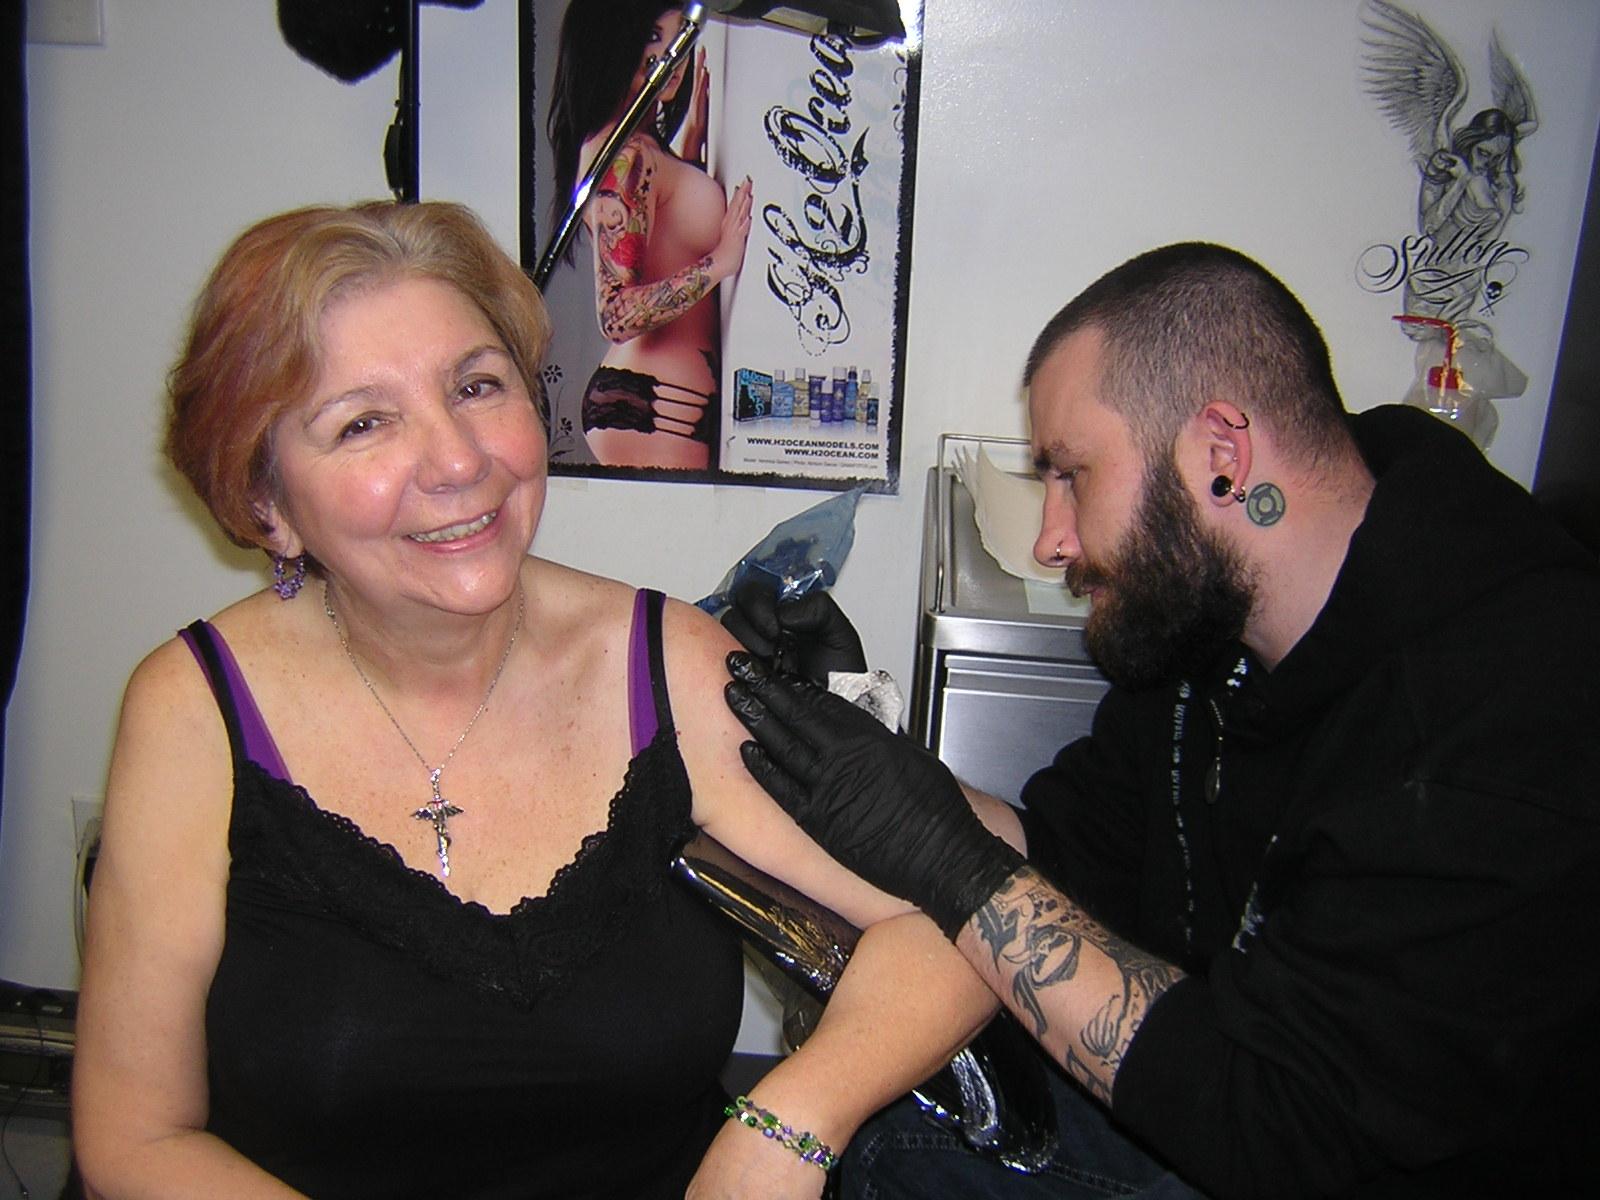 Alab Banat http://thephoenixmovie.com/fcms/girl-outline-tattoo